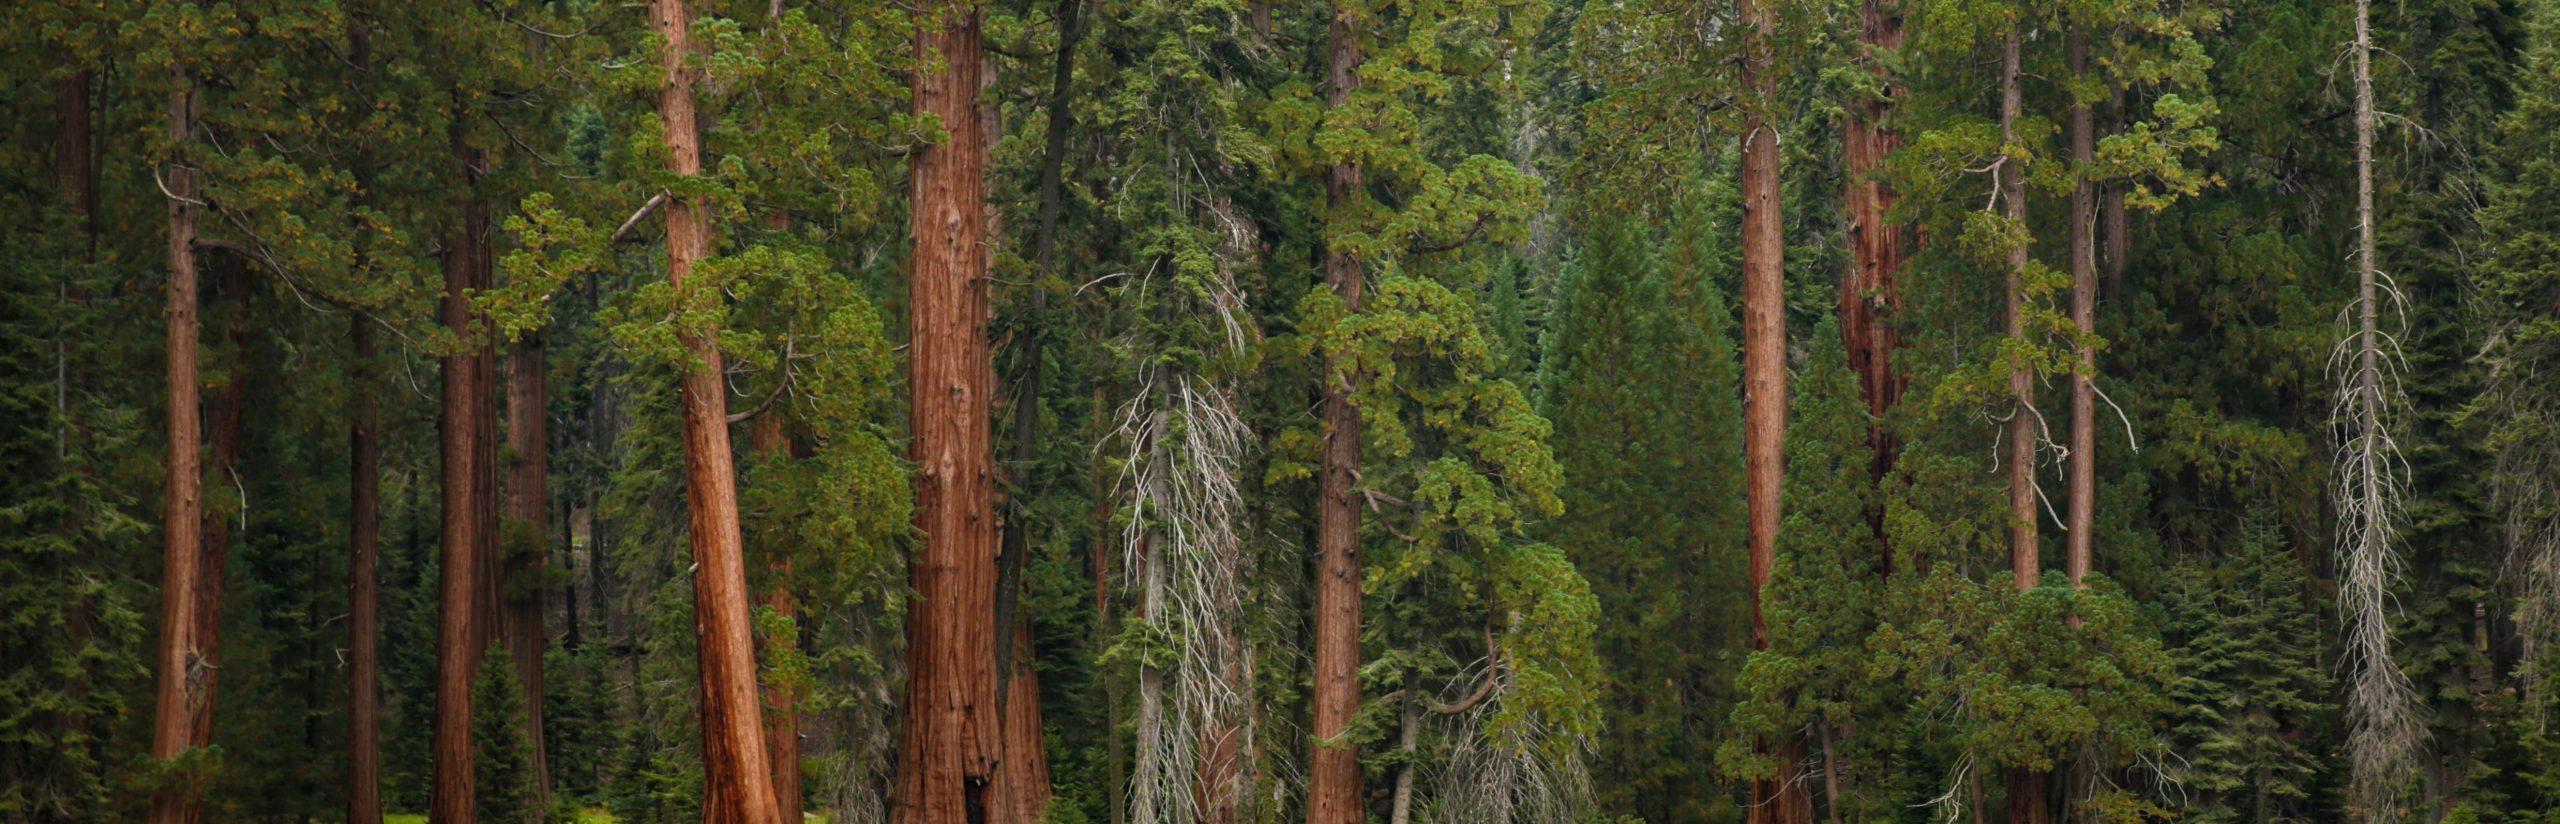 Climbing 100 Trees